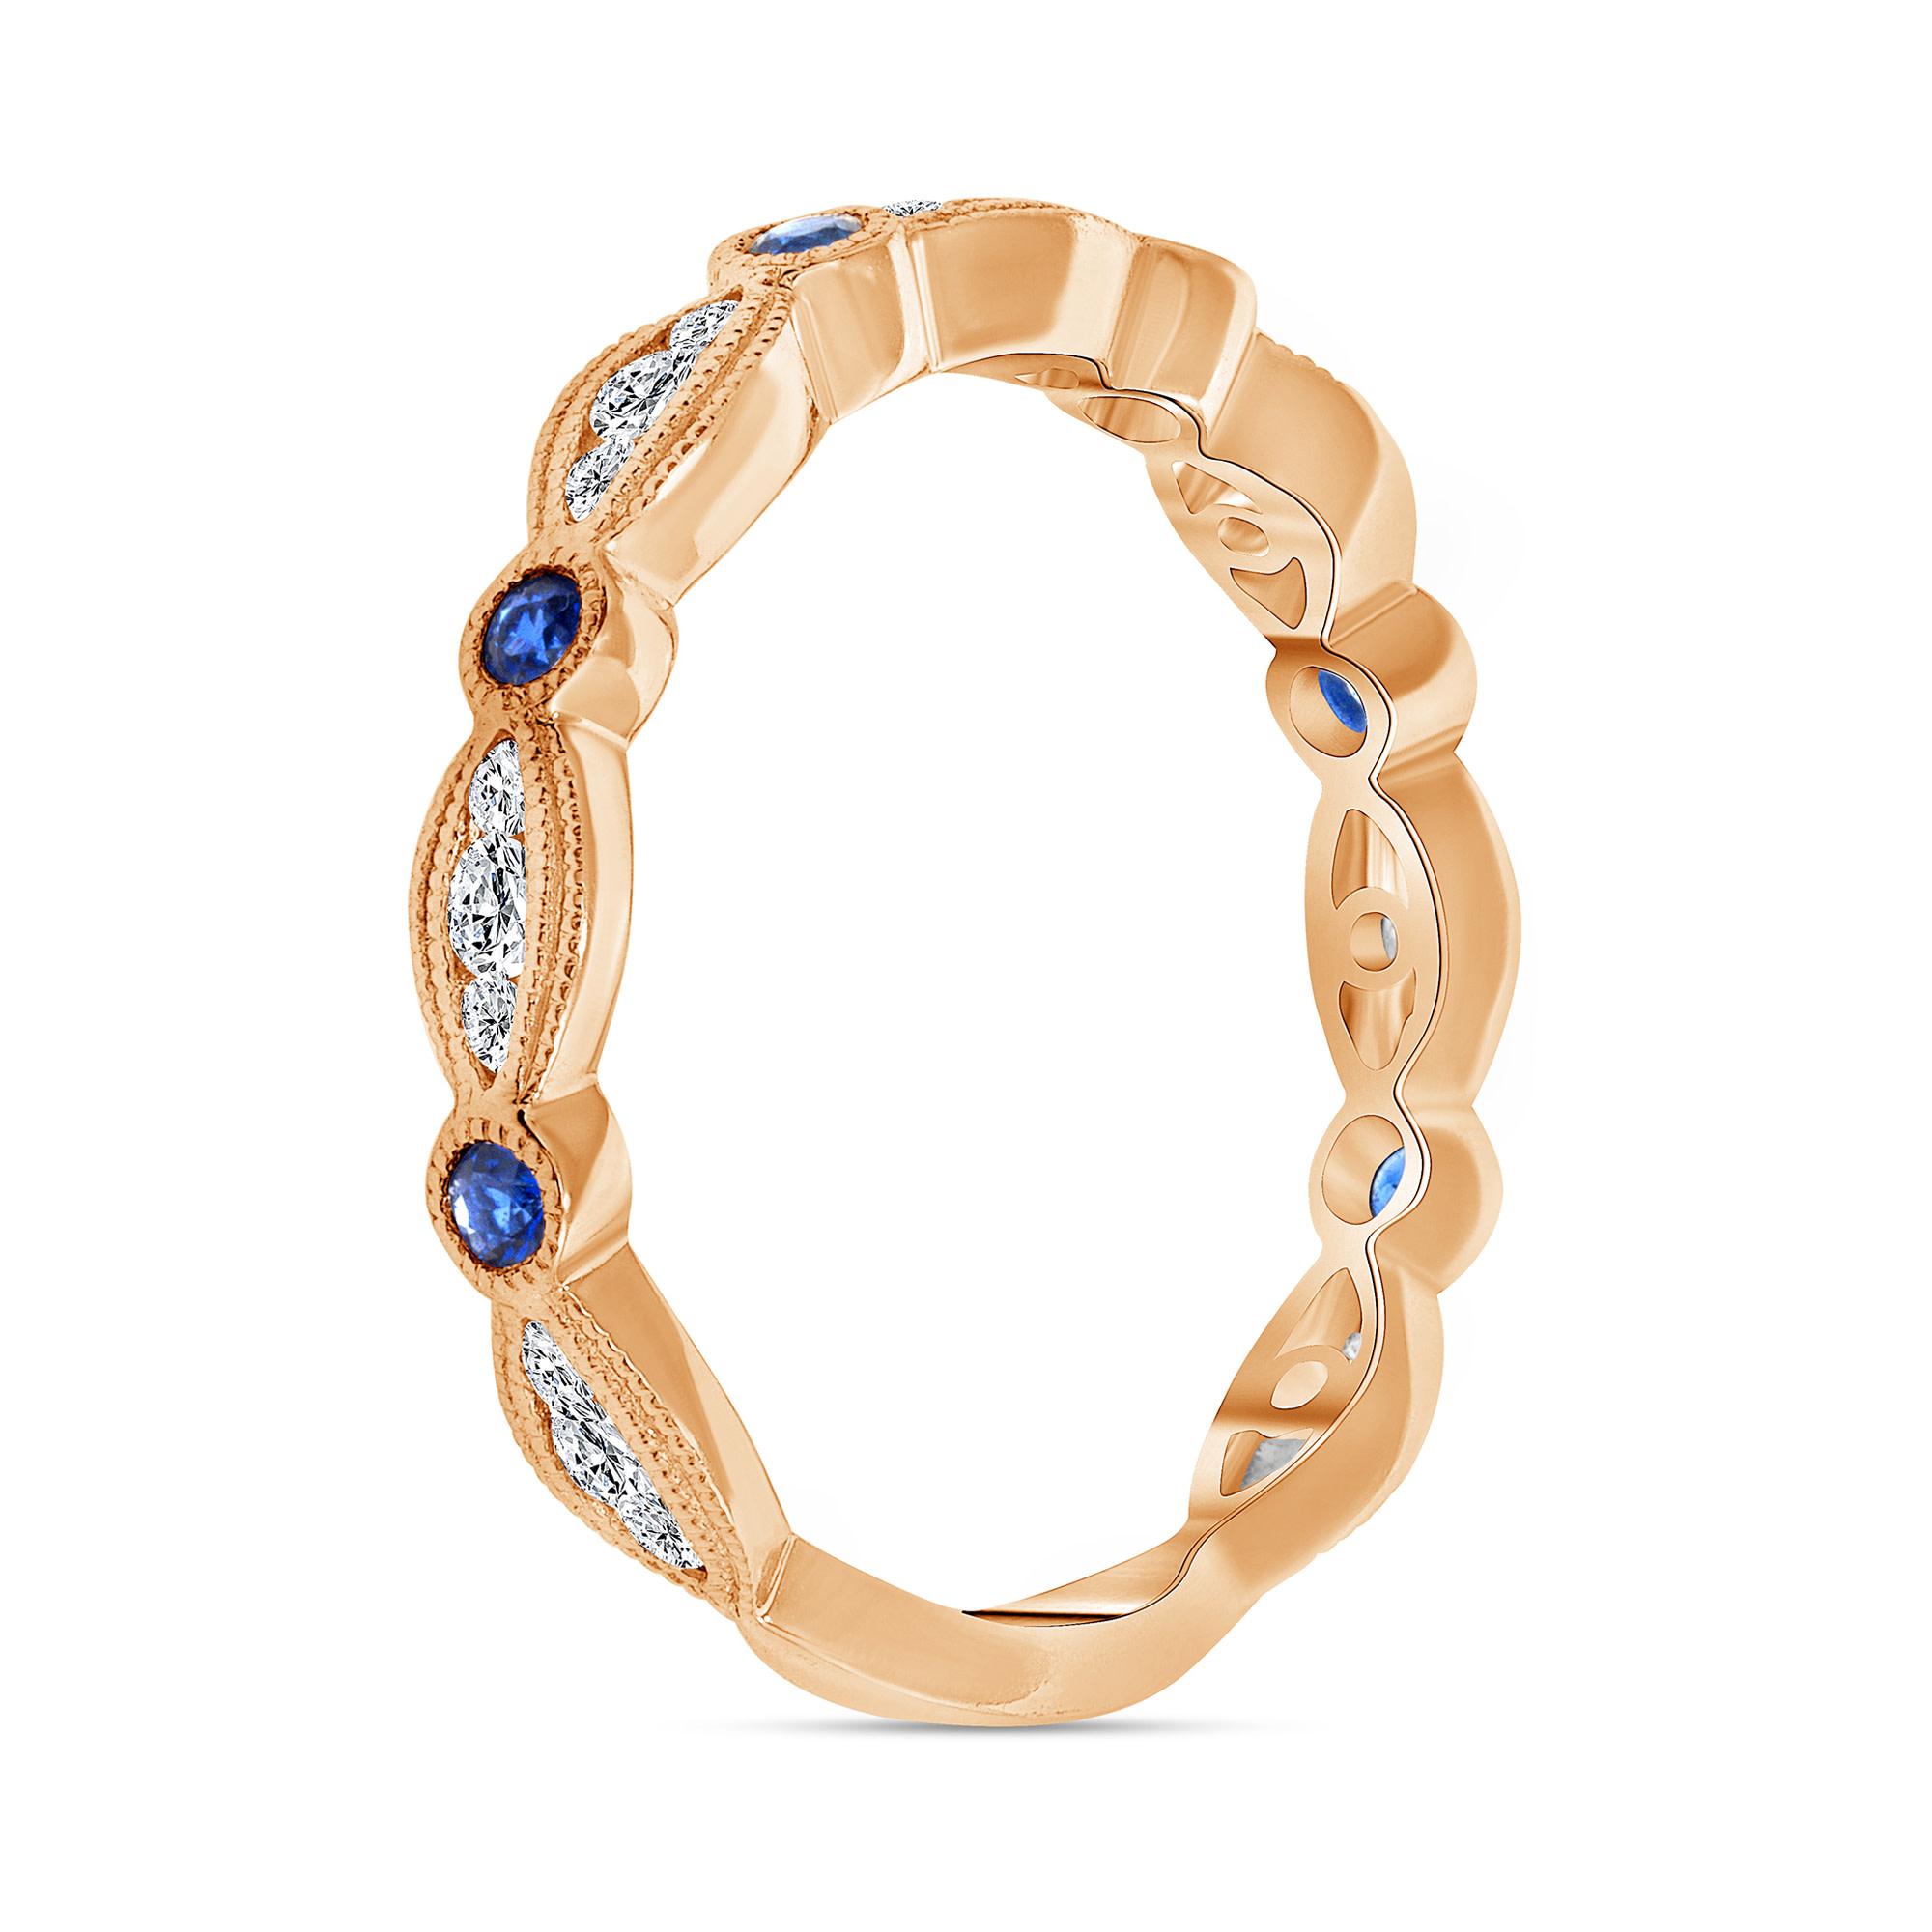 diamond and sapphire wedding ring rose gold